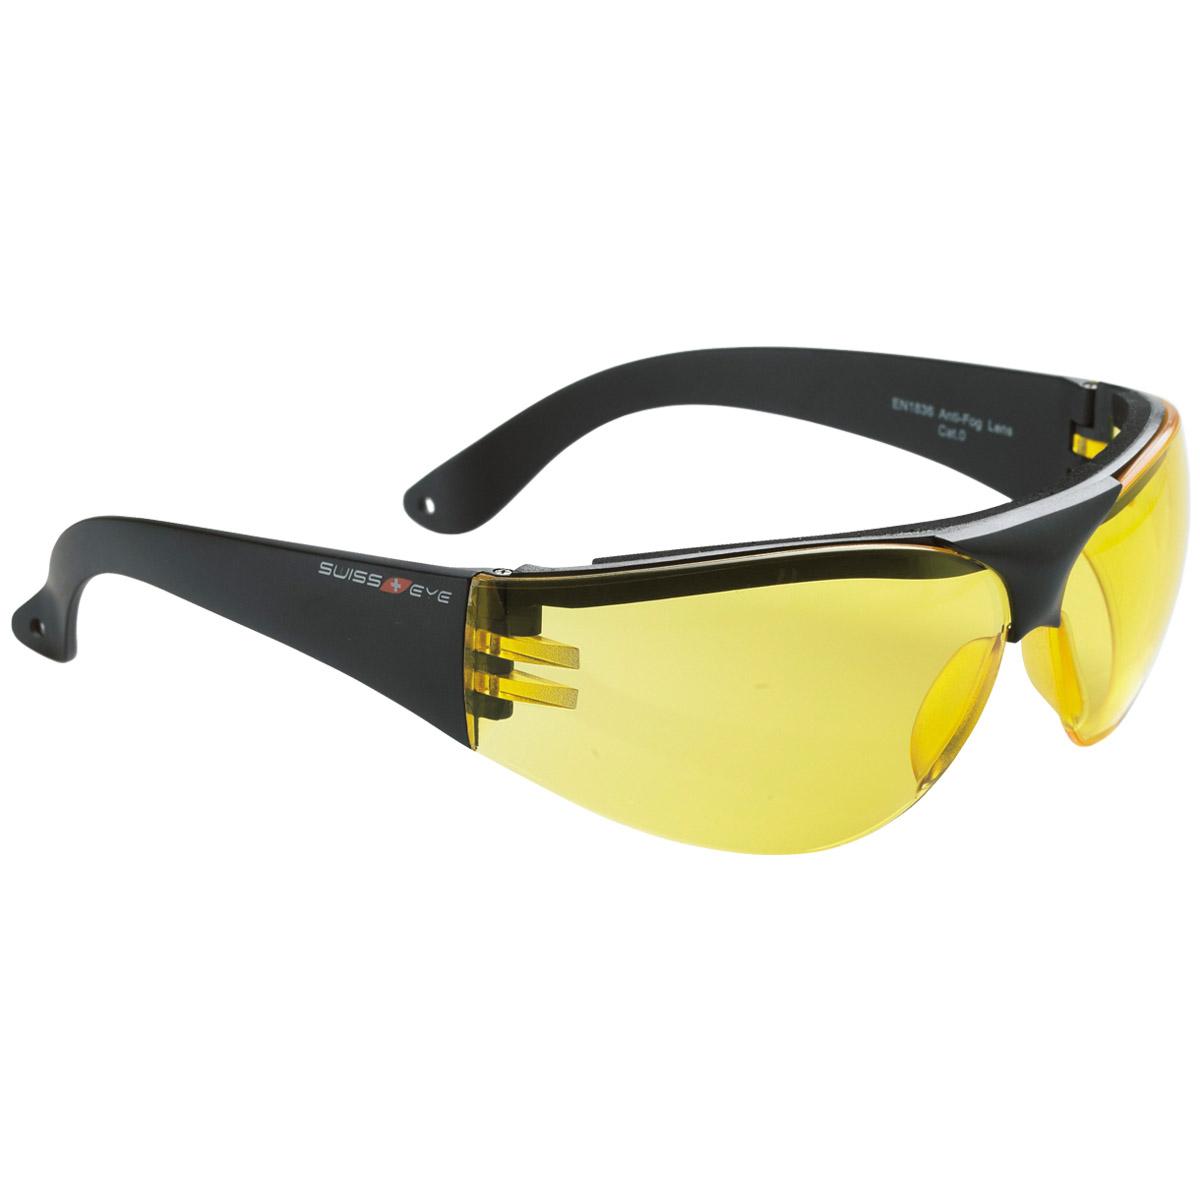 Swiss Eye Outbreak Protector Glasses Black Frame Yellow ...